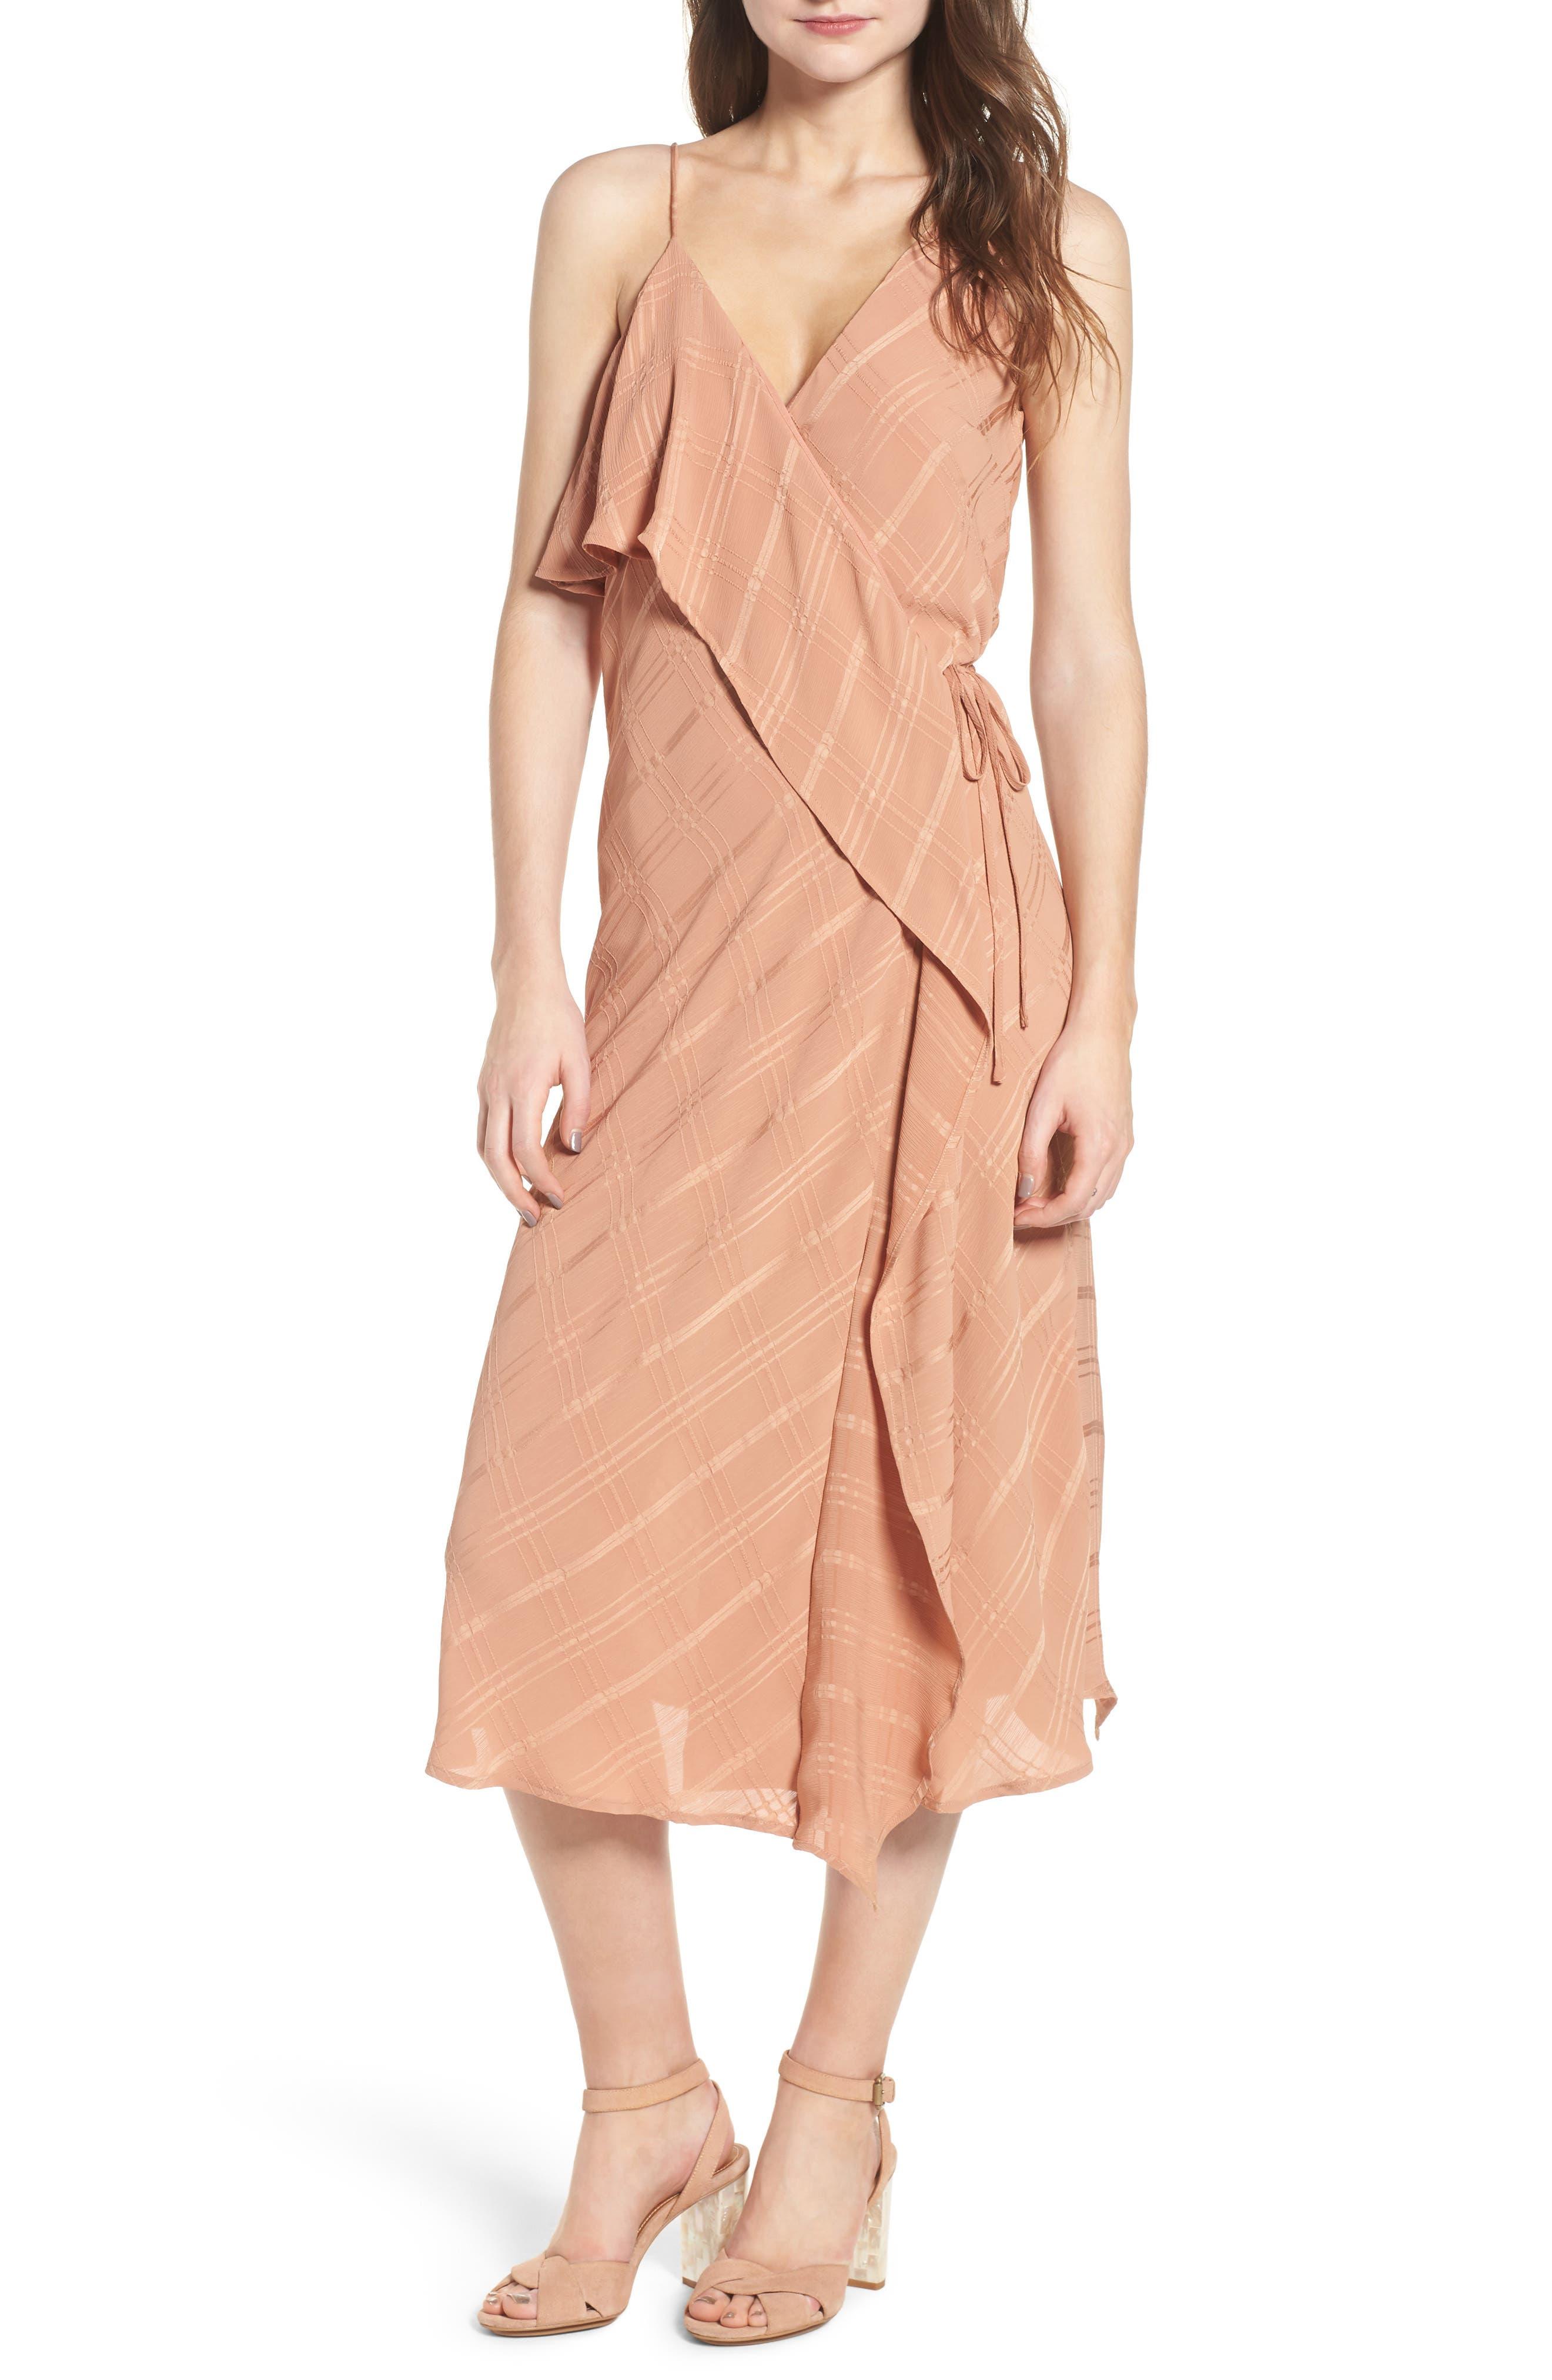 Yoanna Ruffle Trim Wrap Dress,                         Main,                         color, 250